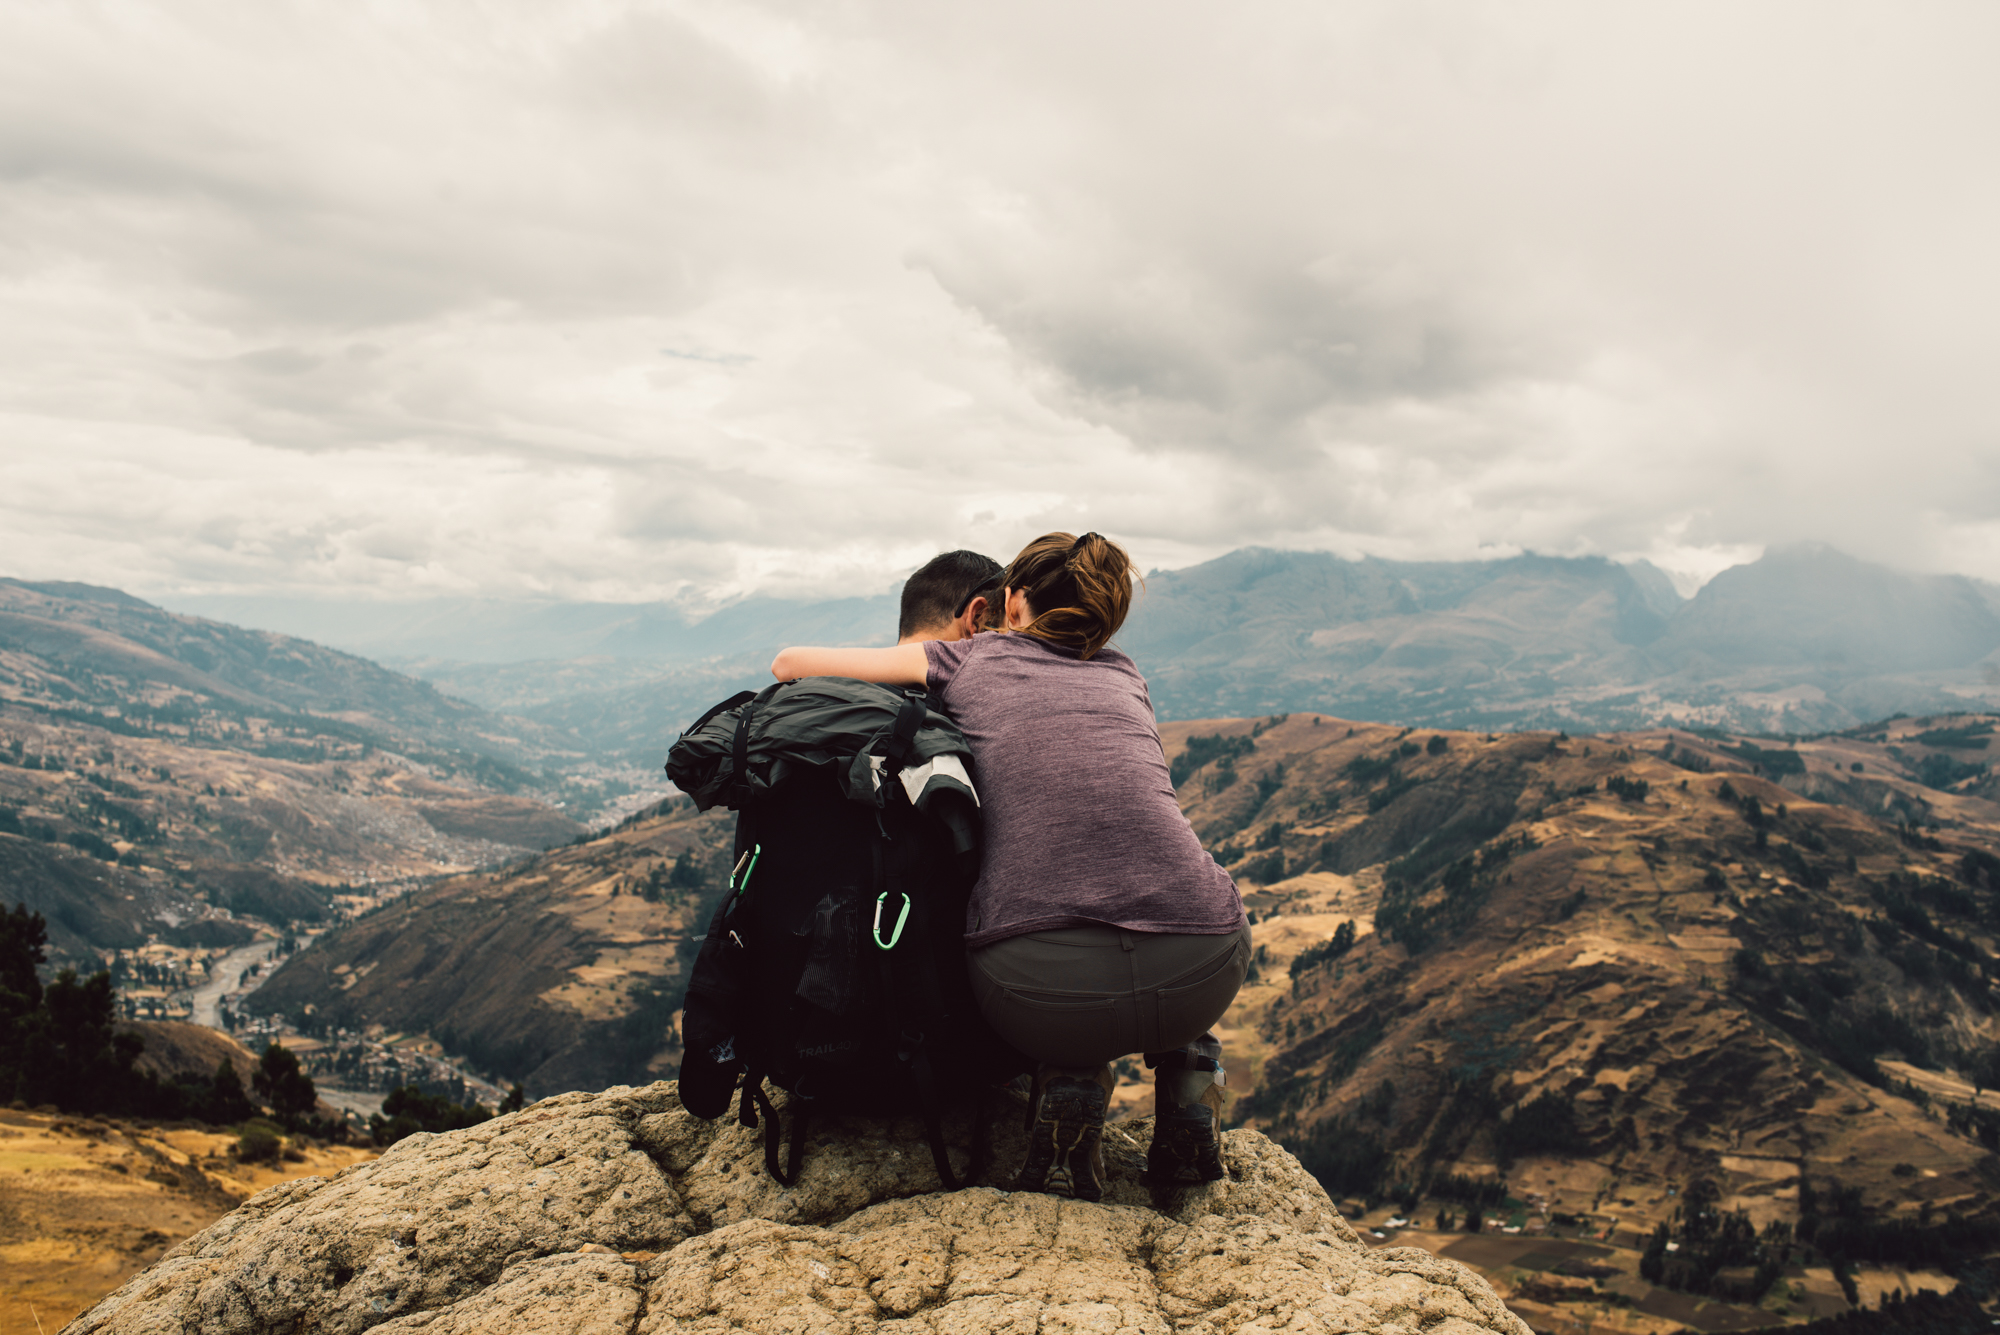 Damian and Jesse Engagement Session Huayhuash Mountain Trekking Peru_52.JPG